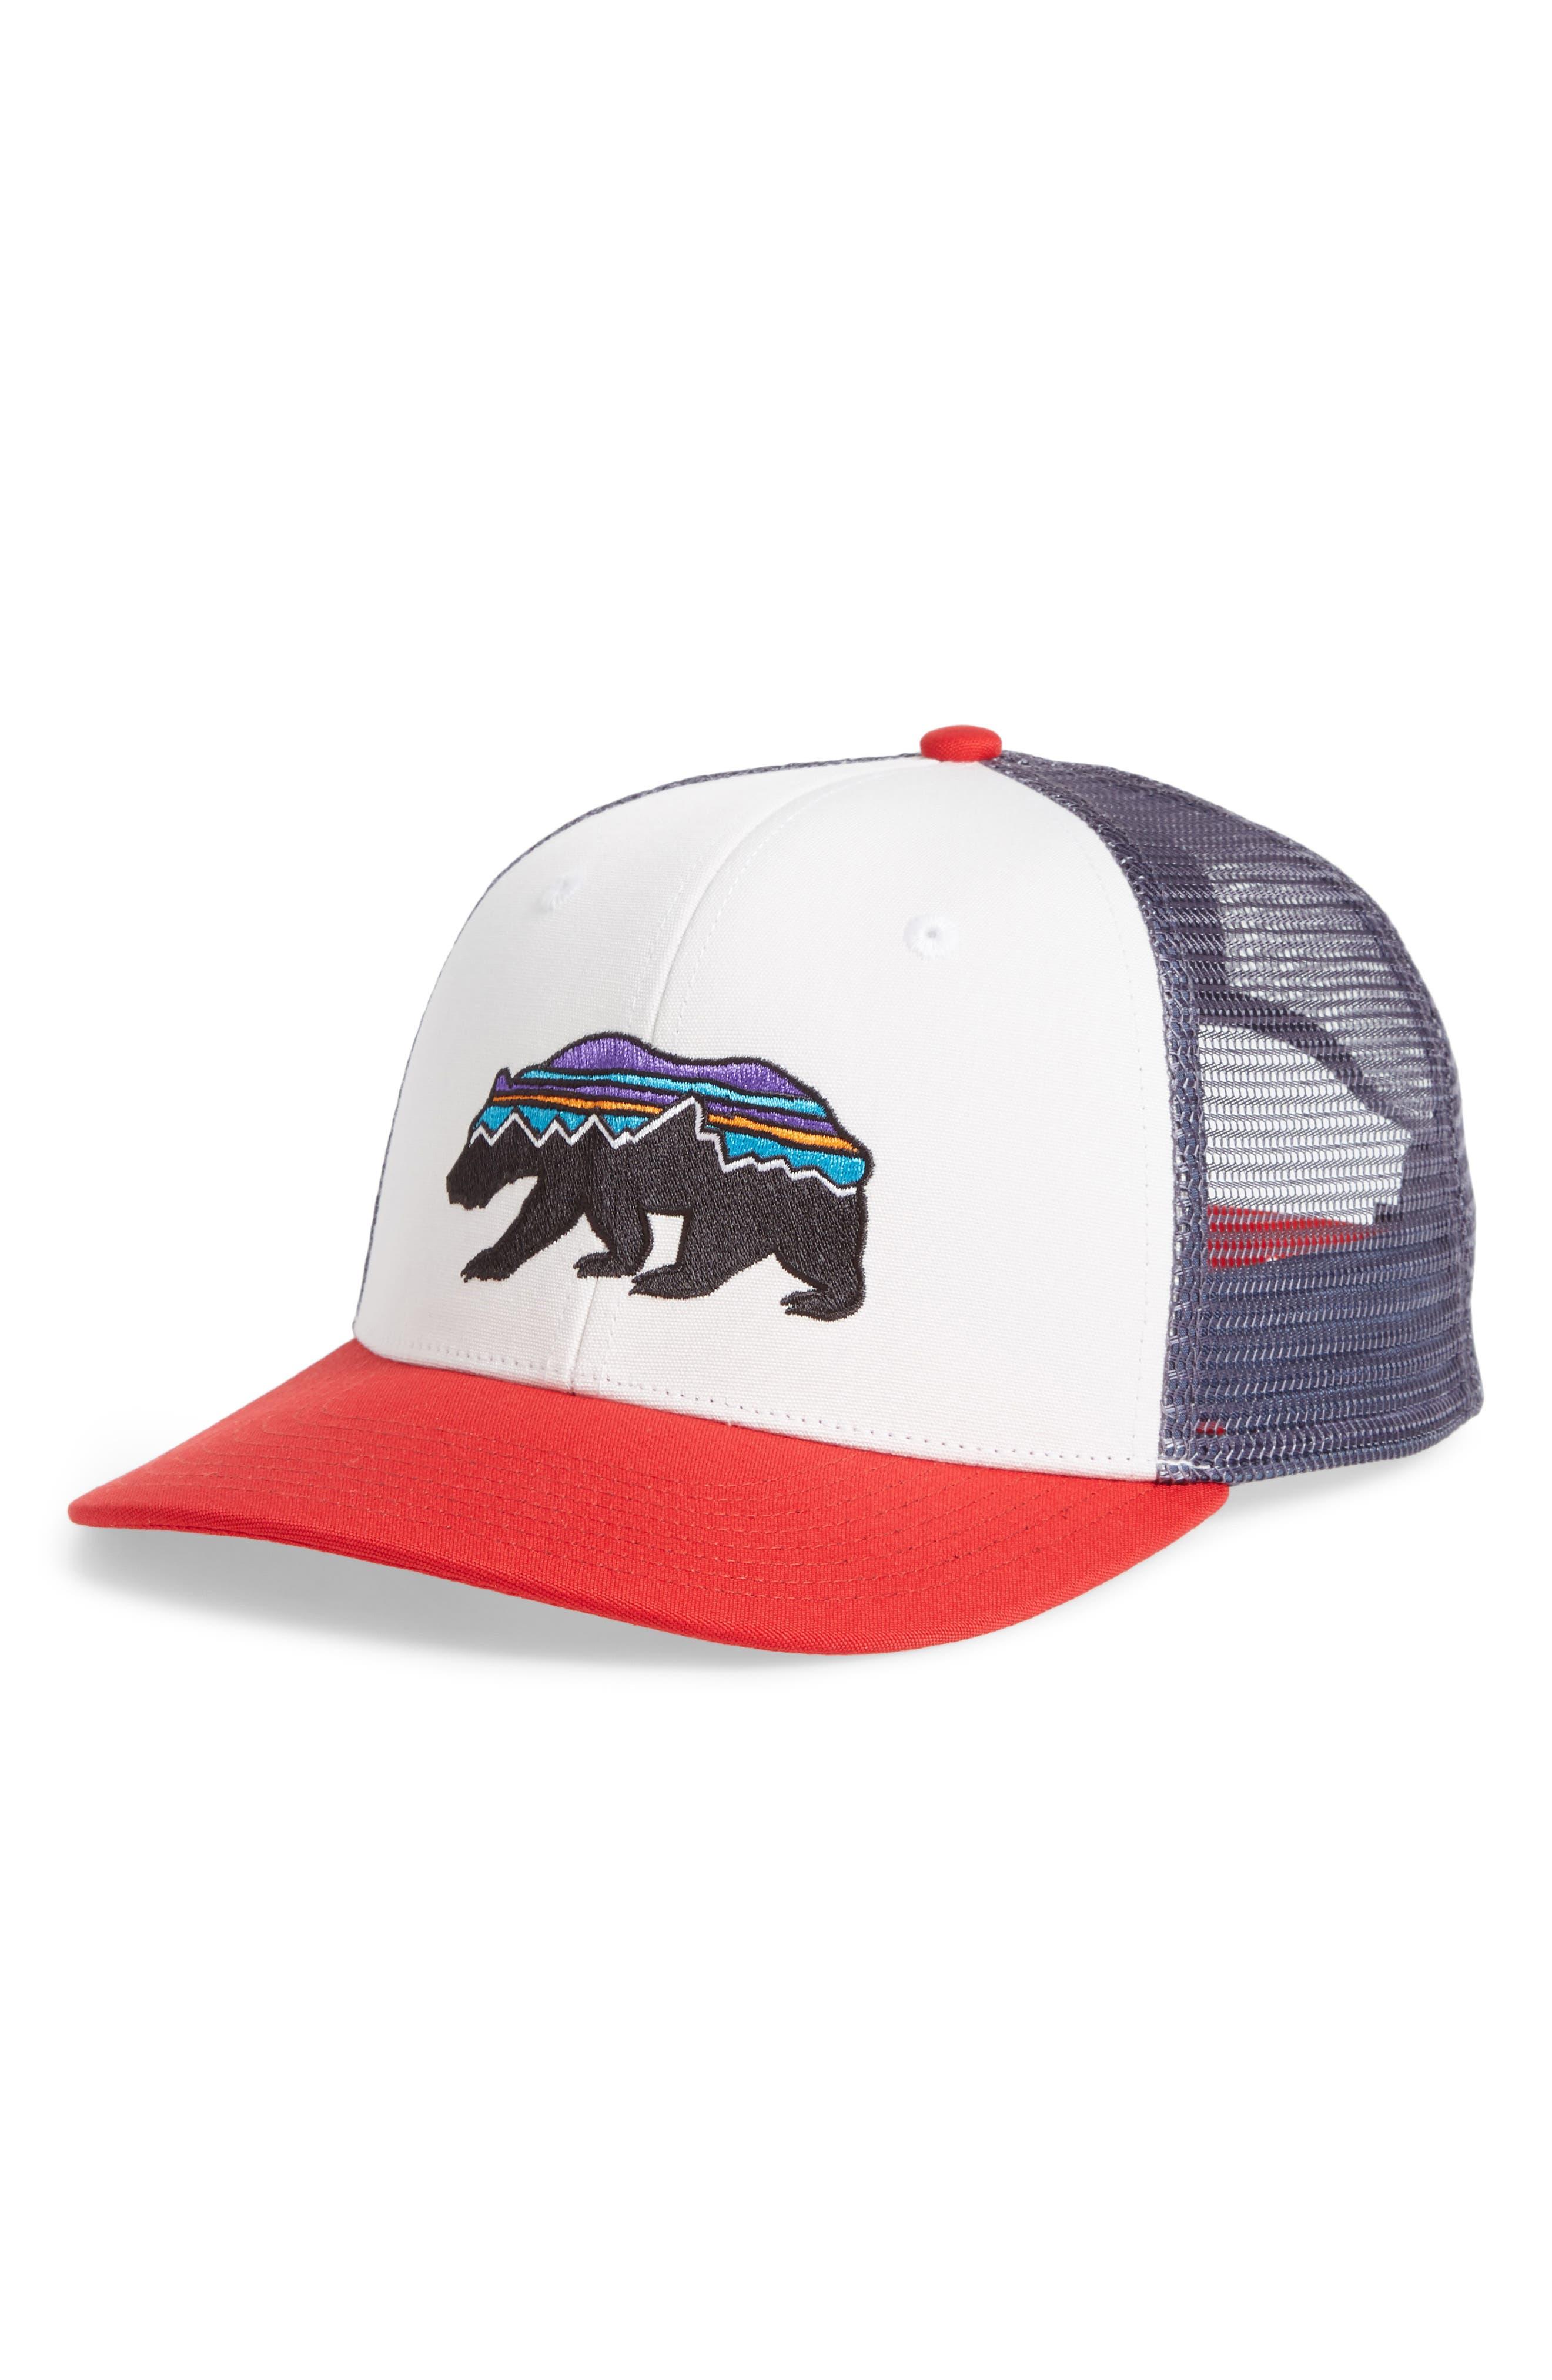 PATAGONIA, Fitz Roy Bear Trucker Cap, Main thumbnail 1, color, WHITE